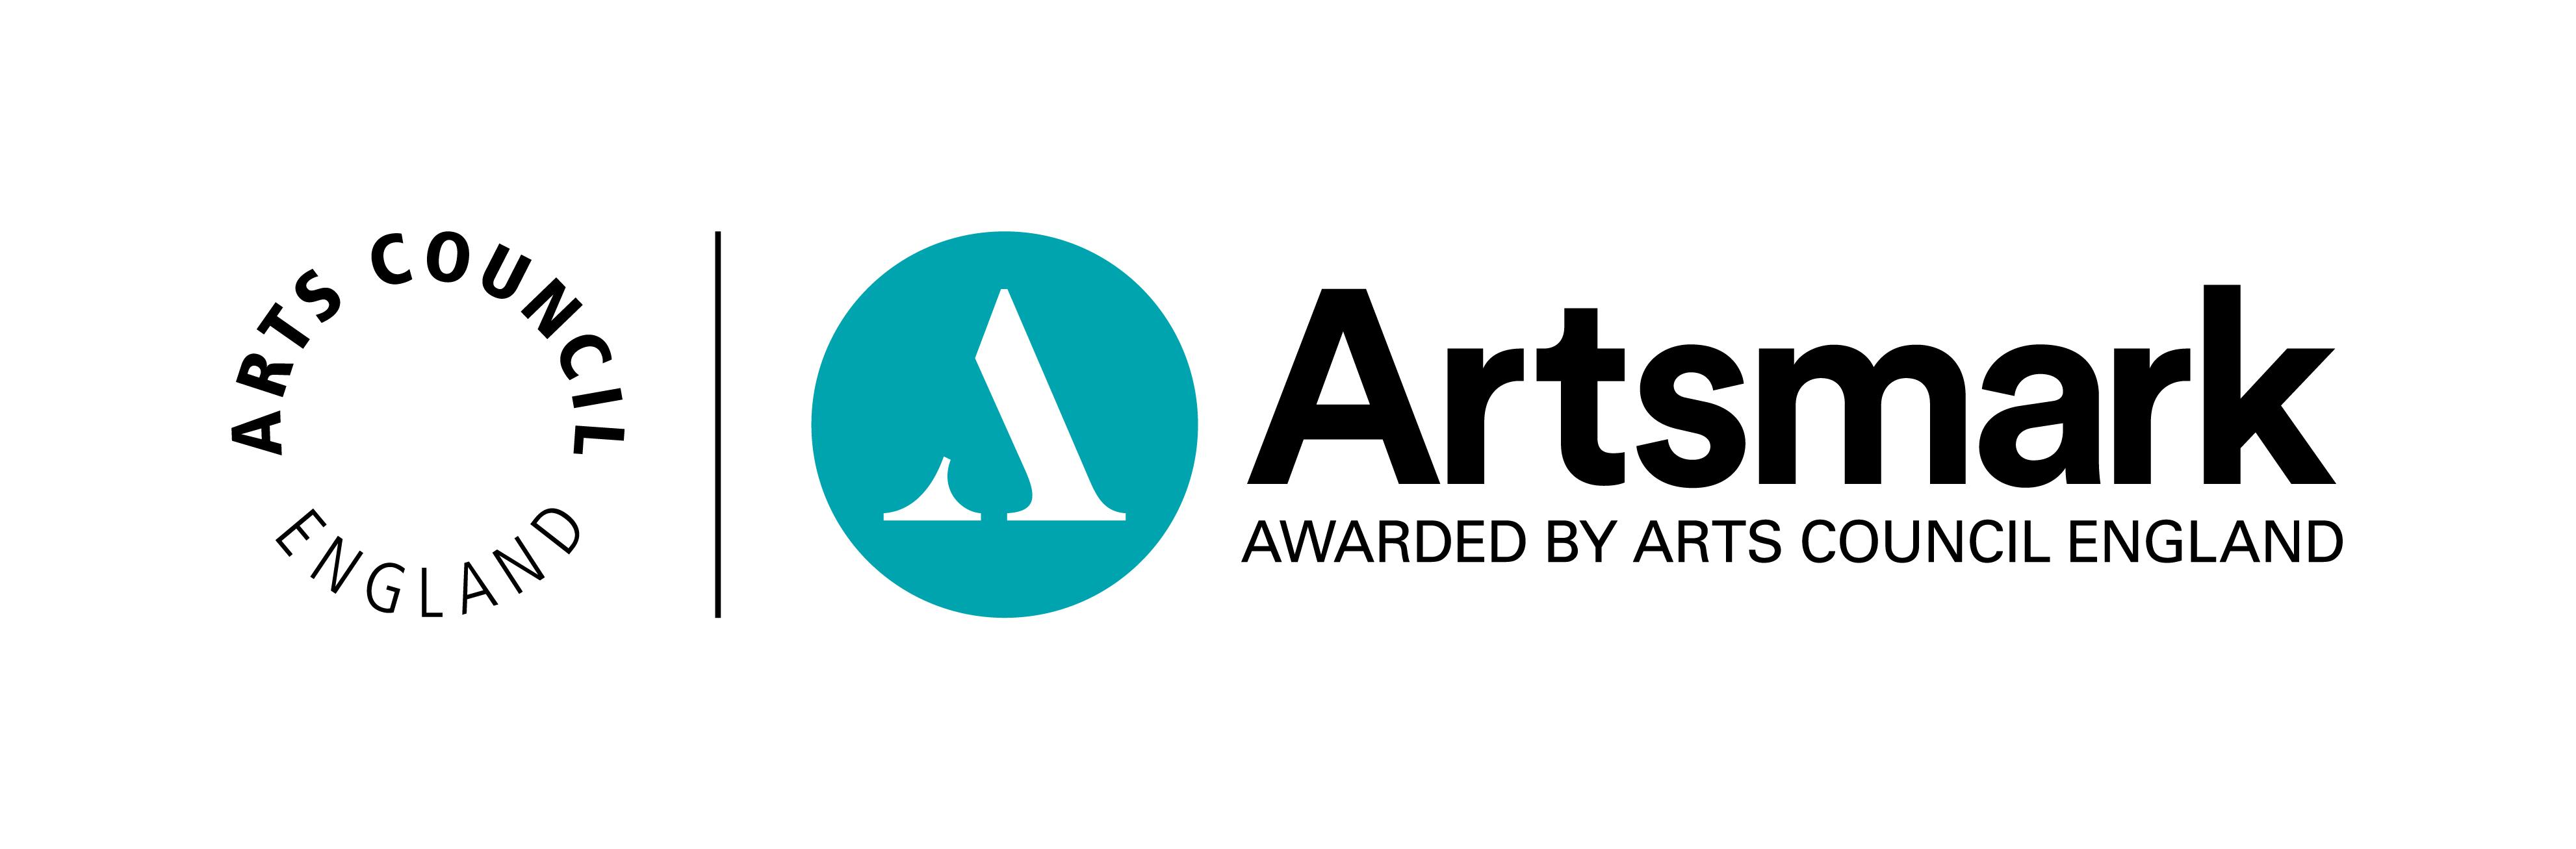 Artsmark - Wikipedia